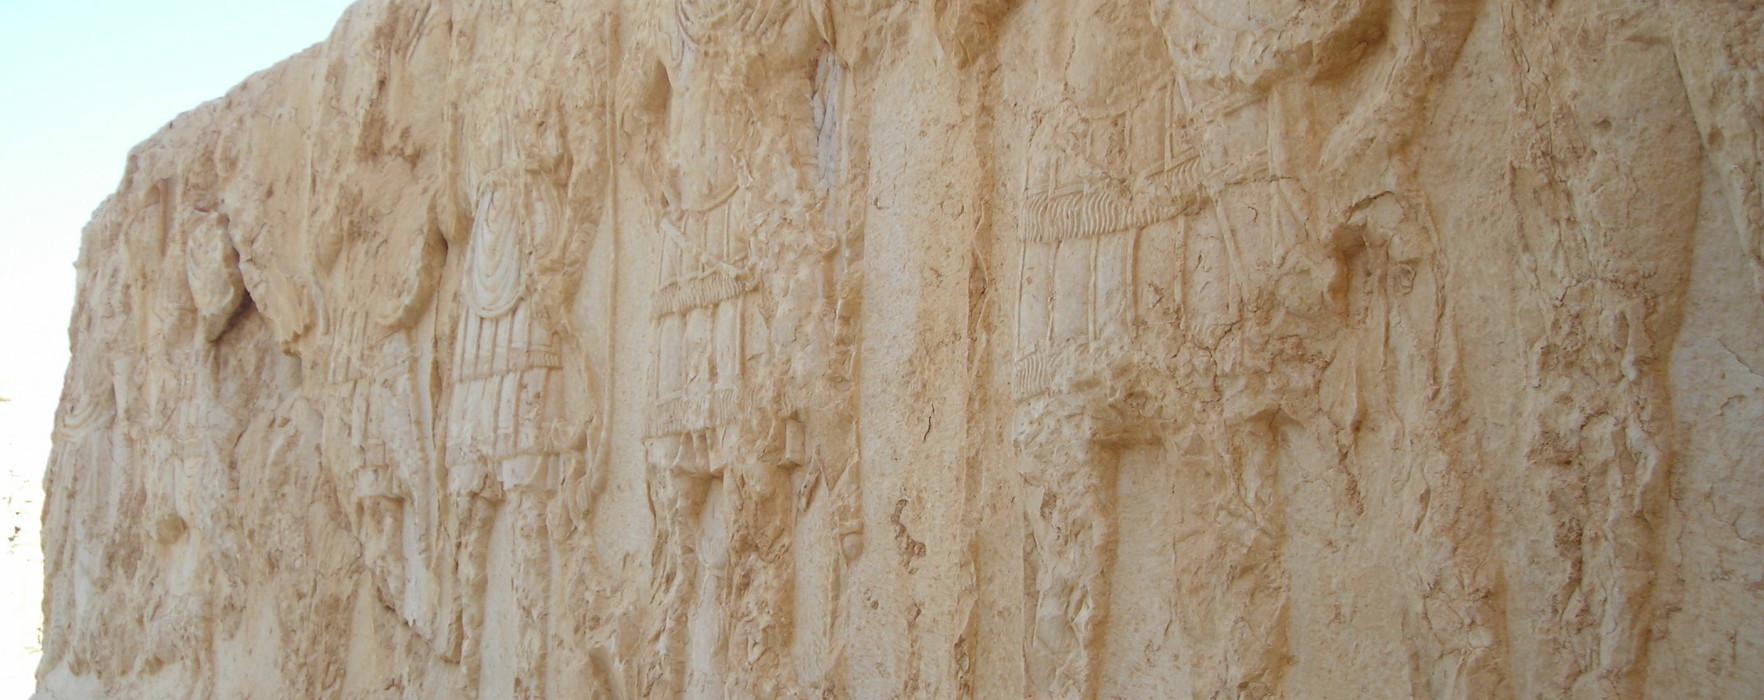 Palmyra: storia, meraviglia e morte